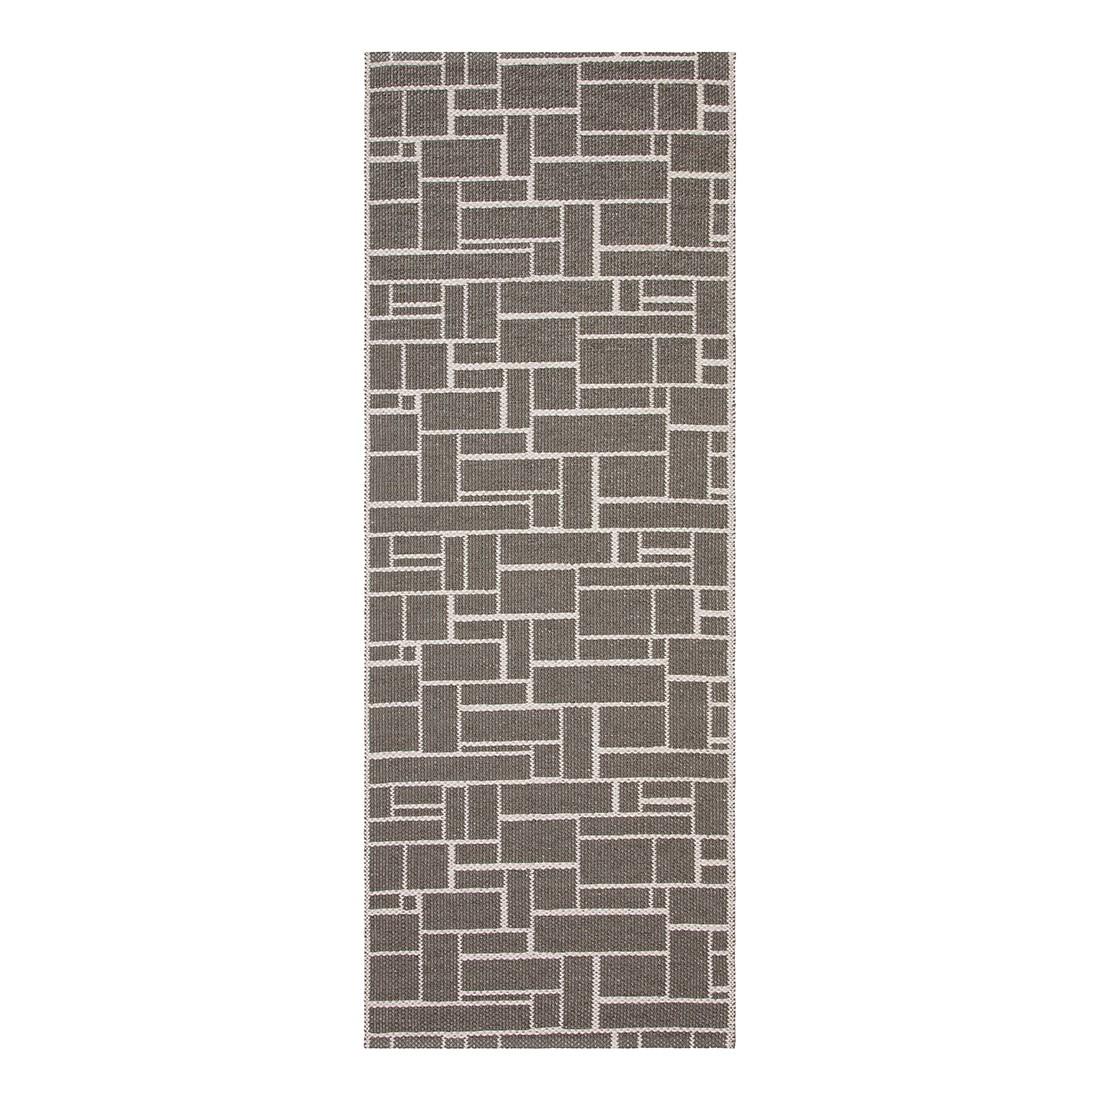 In-/Outdoorteppich Dama I – Kunstfaser SchieferGrau/Hellgrau – 60 x 200 cm, Swedy jetzt kaufen